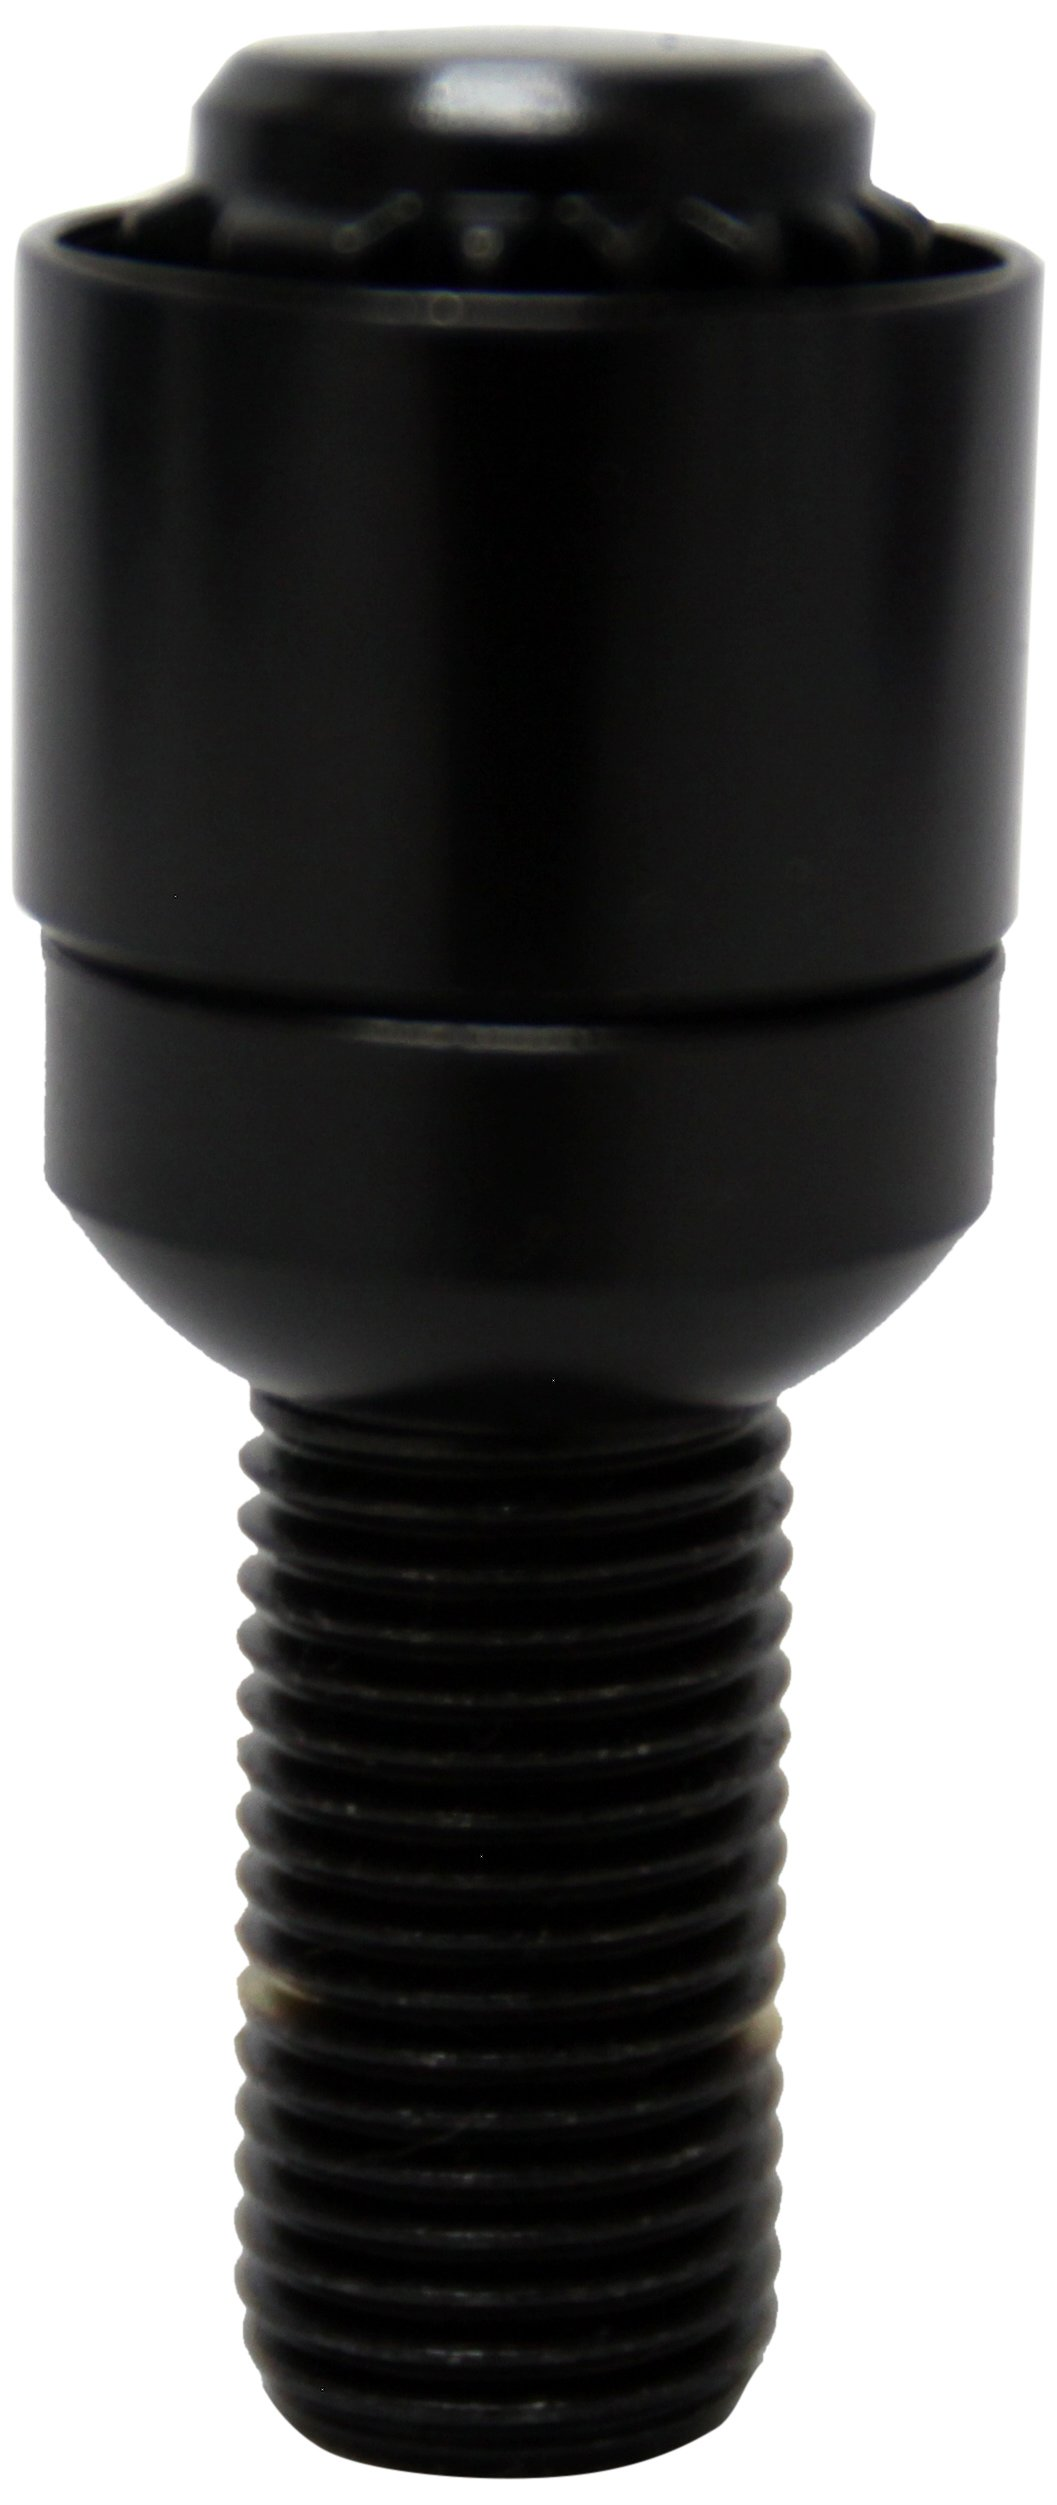 Lug Nut, 12mm x 1.25 Thread Size Kics WKIC3M Leggdura Racing Green Set of 20